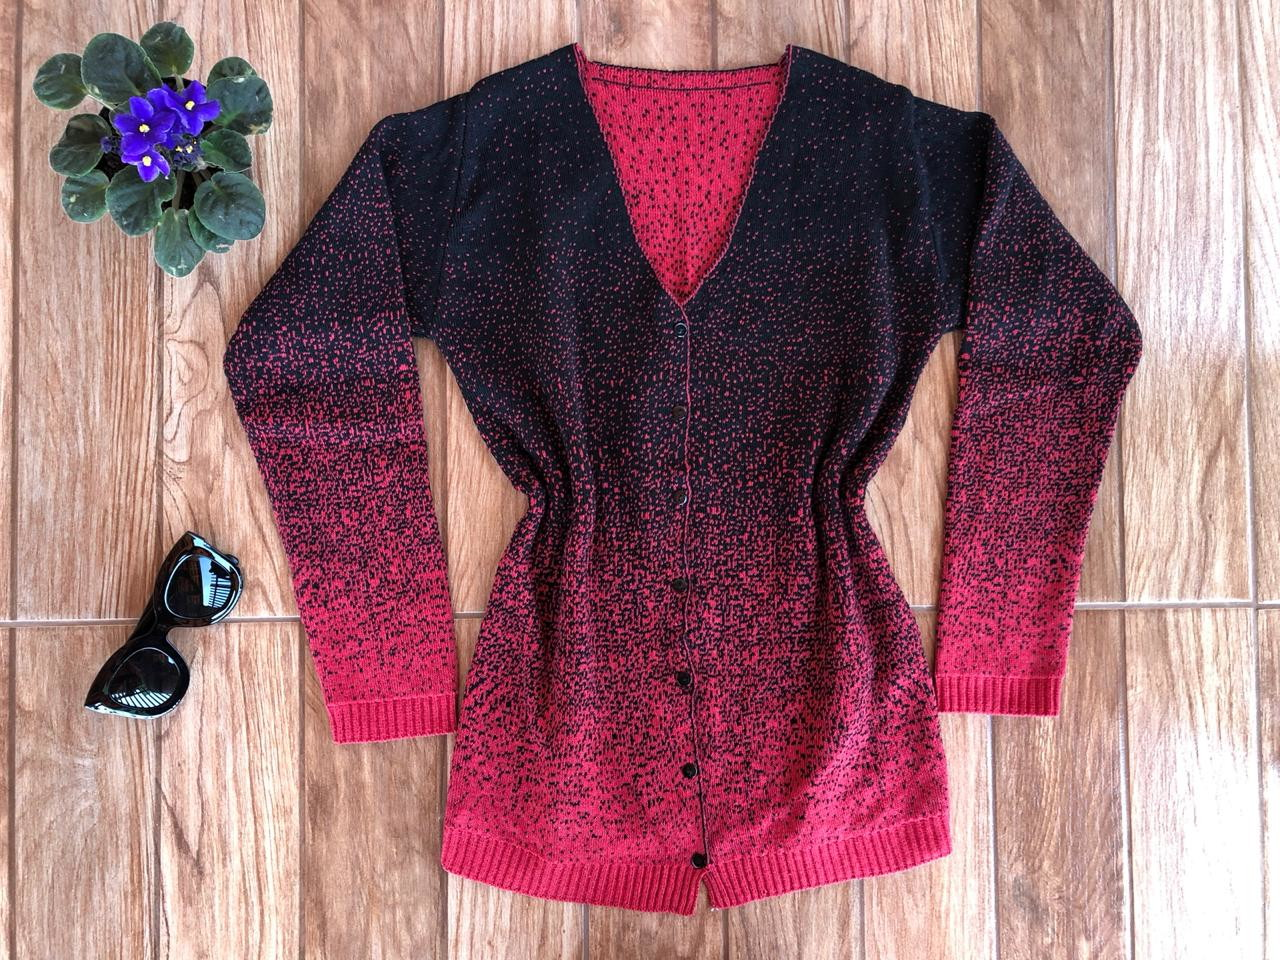 54bffb8166 Blusa de Frio Cardigan Varias Cores Casaco de lã Tricot no Elo7 ...